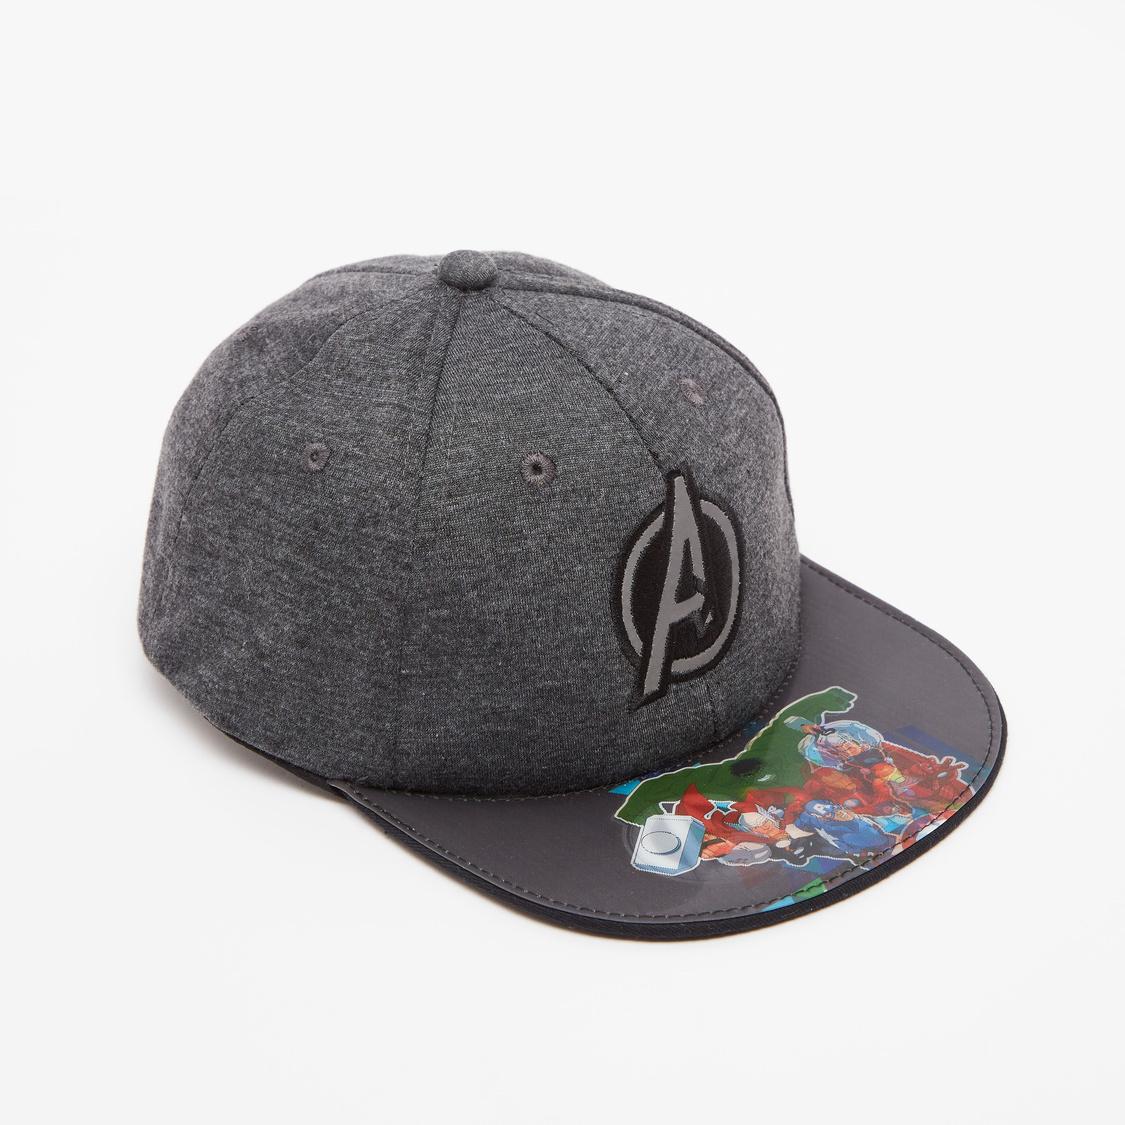 Avengers Print Baseball Cap